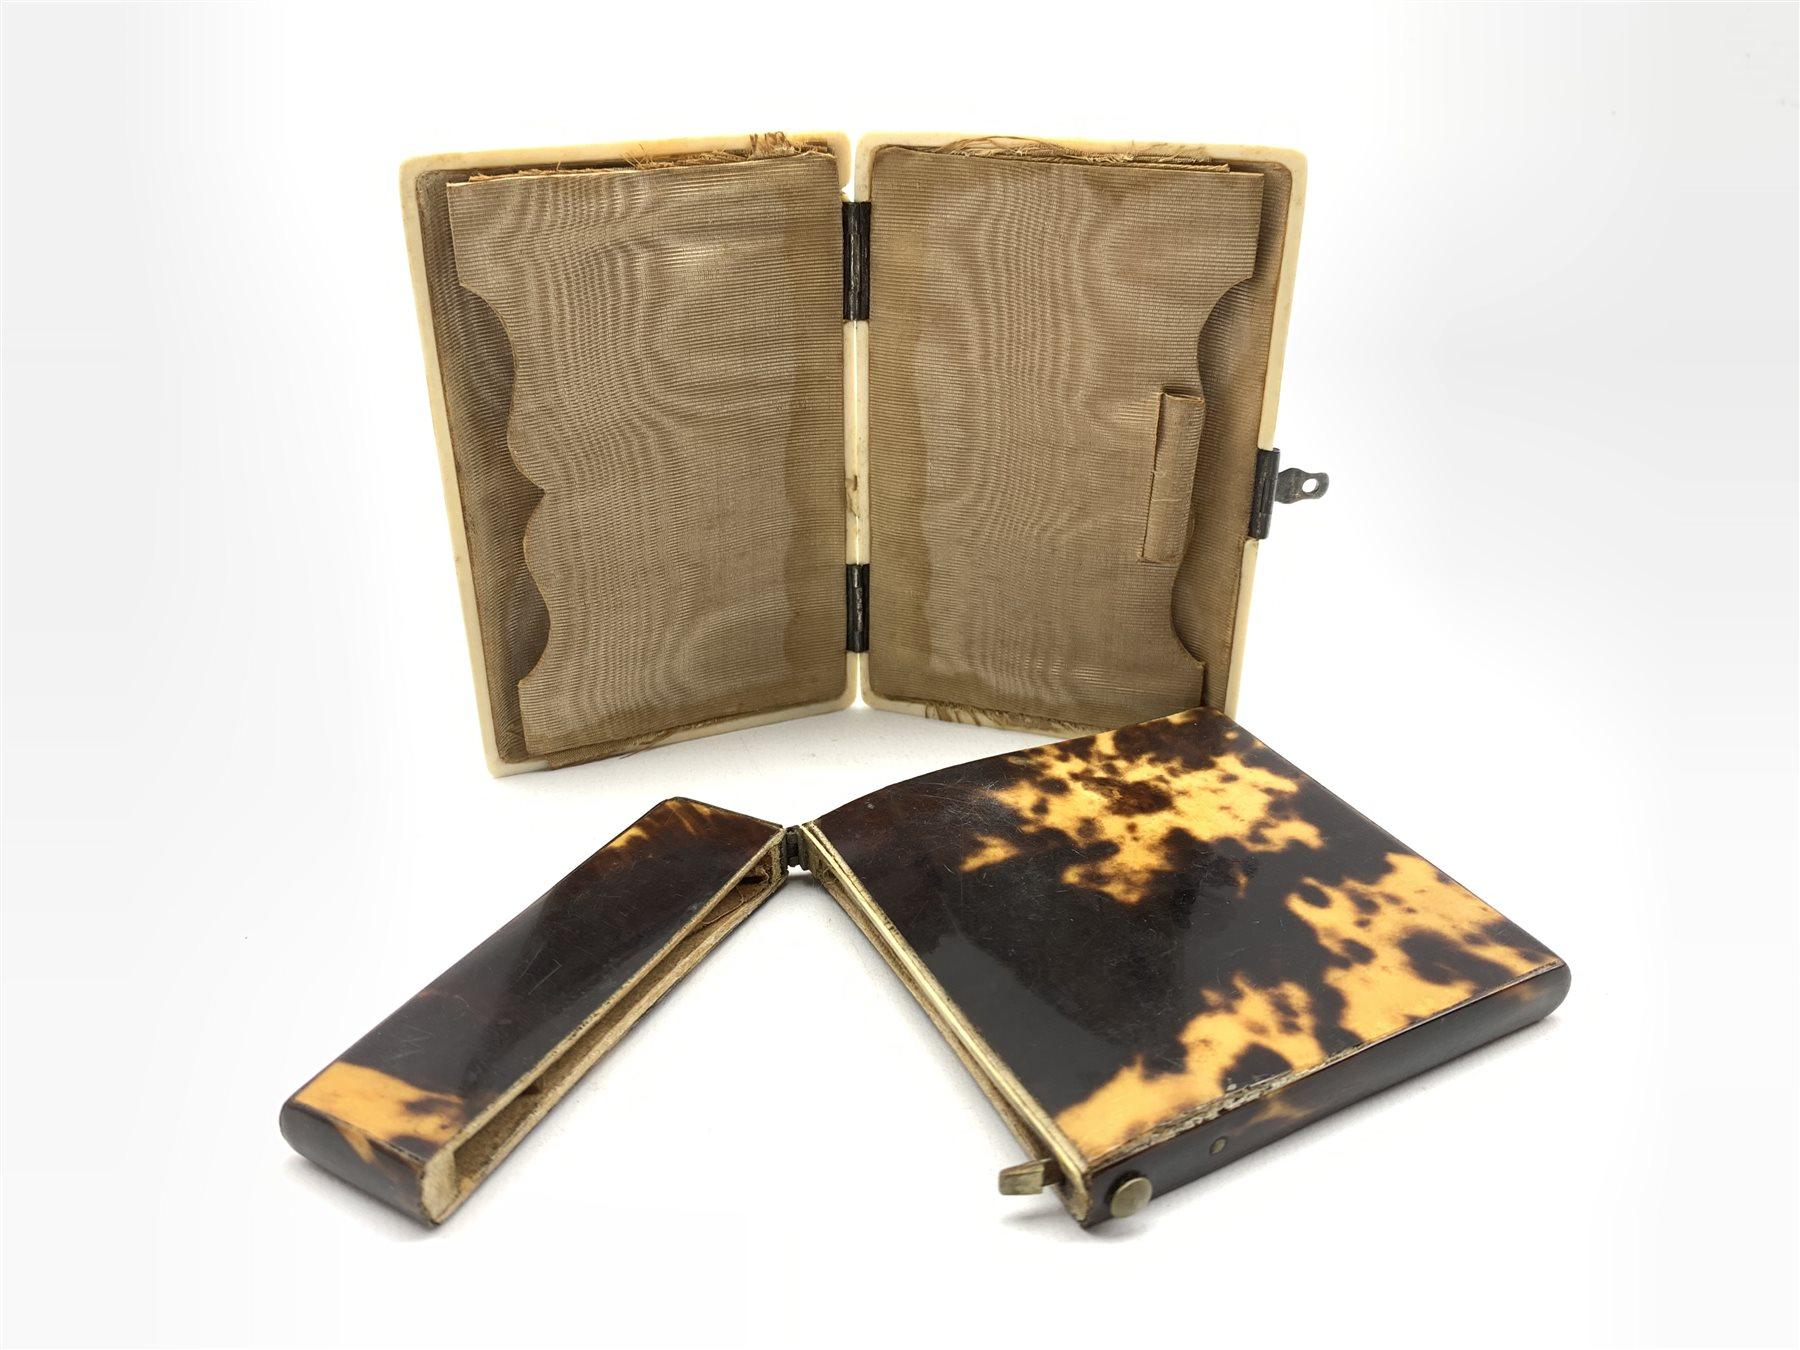 Victorian ivory rectangular card case - Image 3 of 5